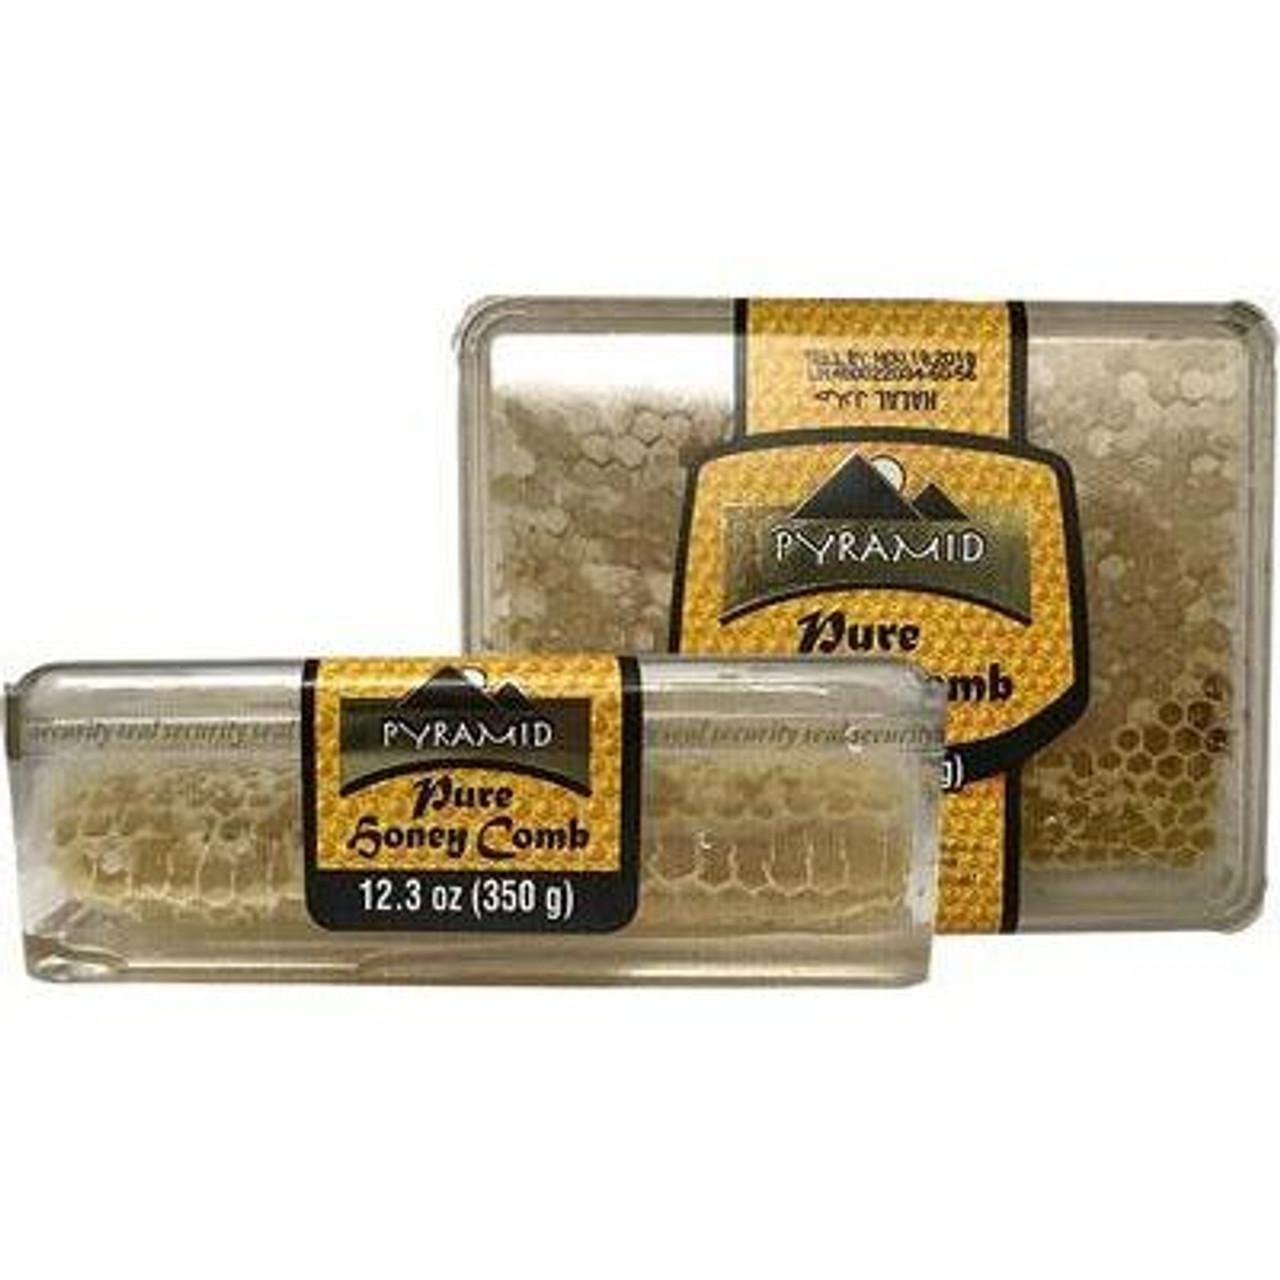 Pyramid Honey w/Comb